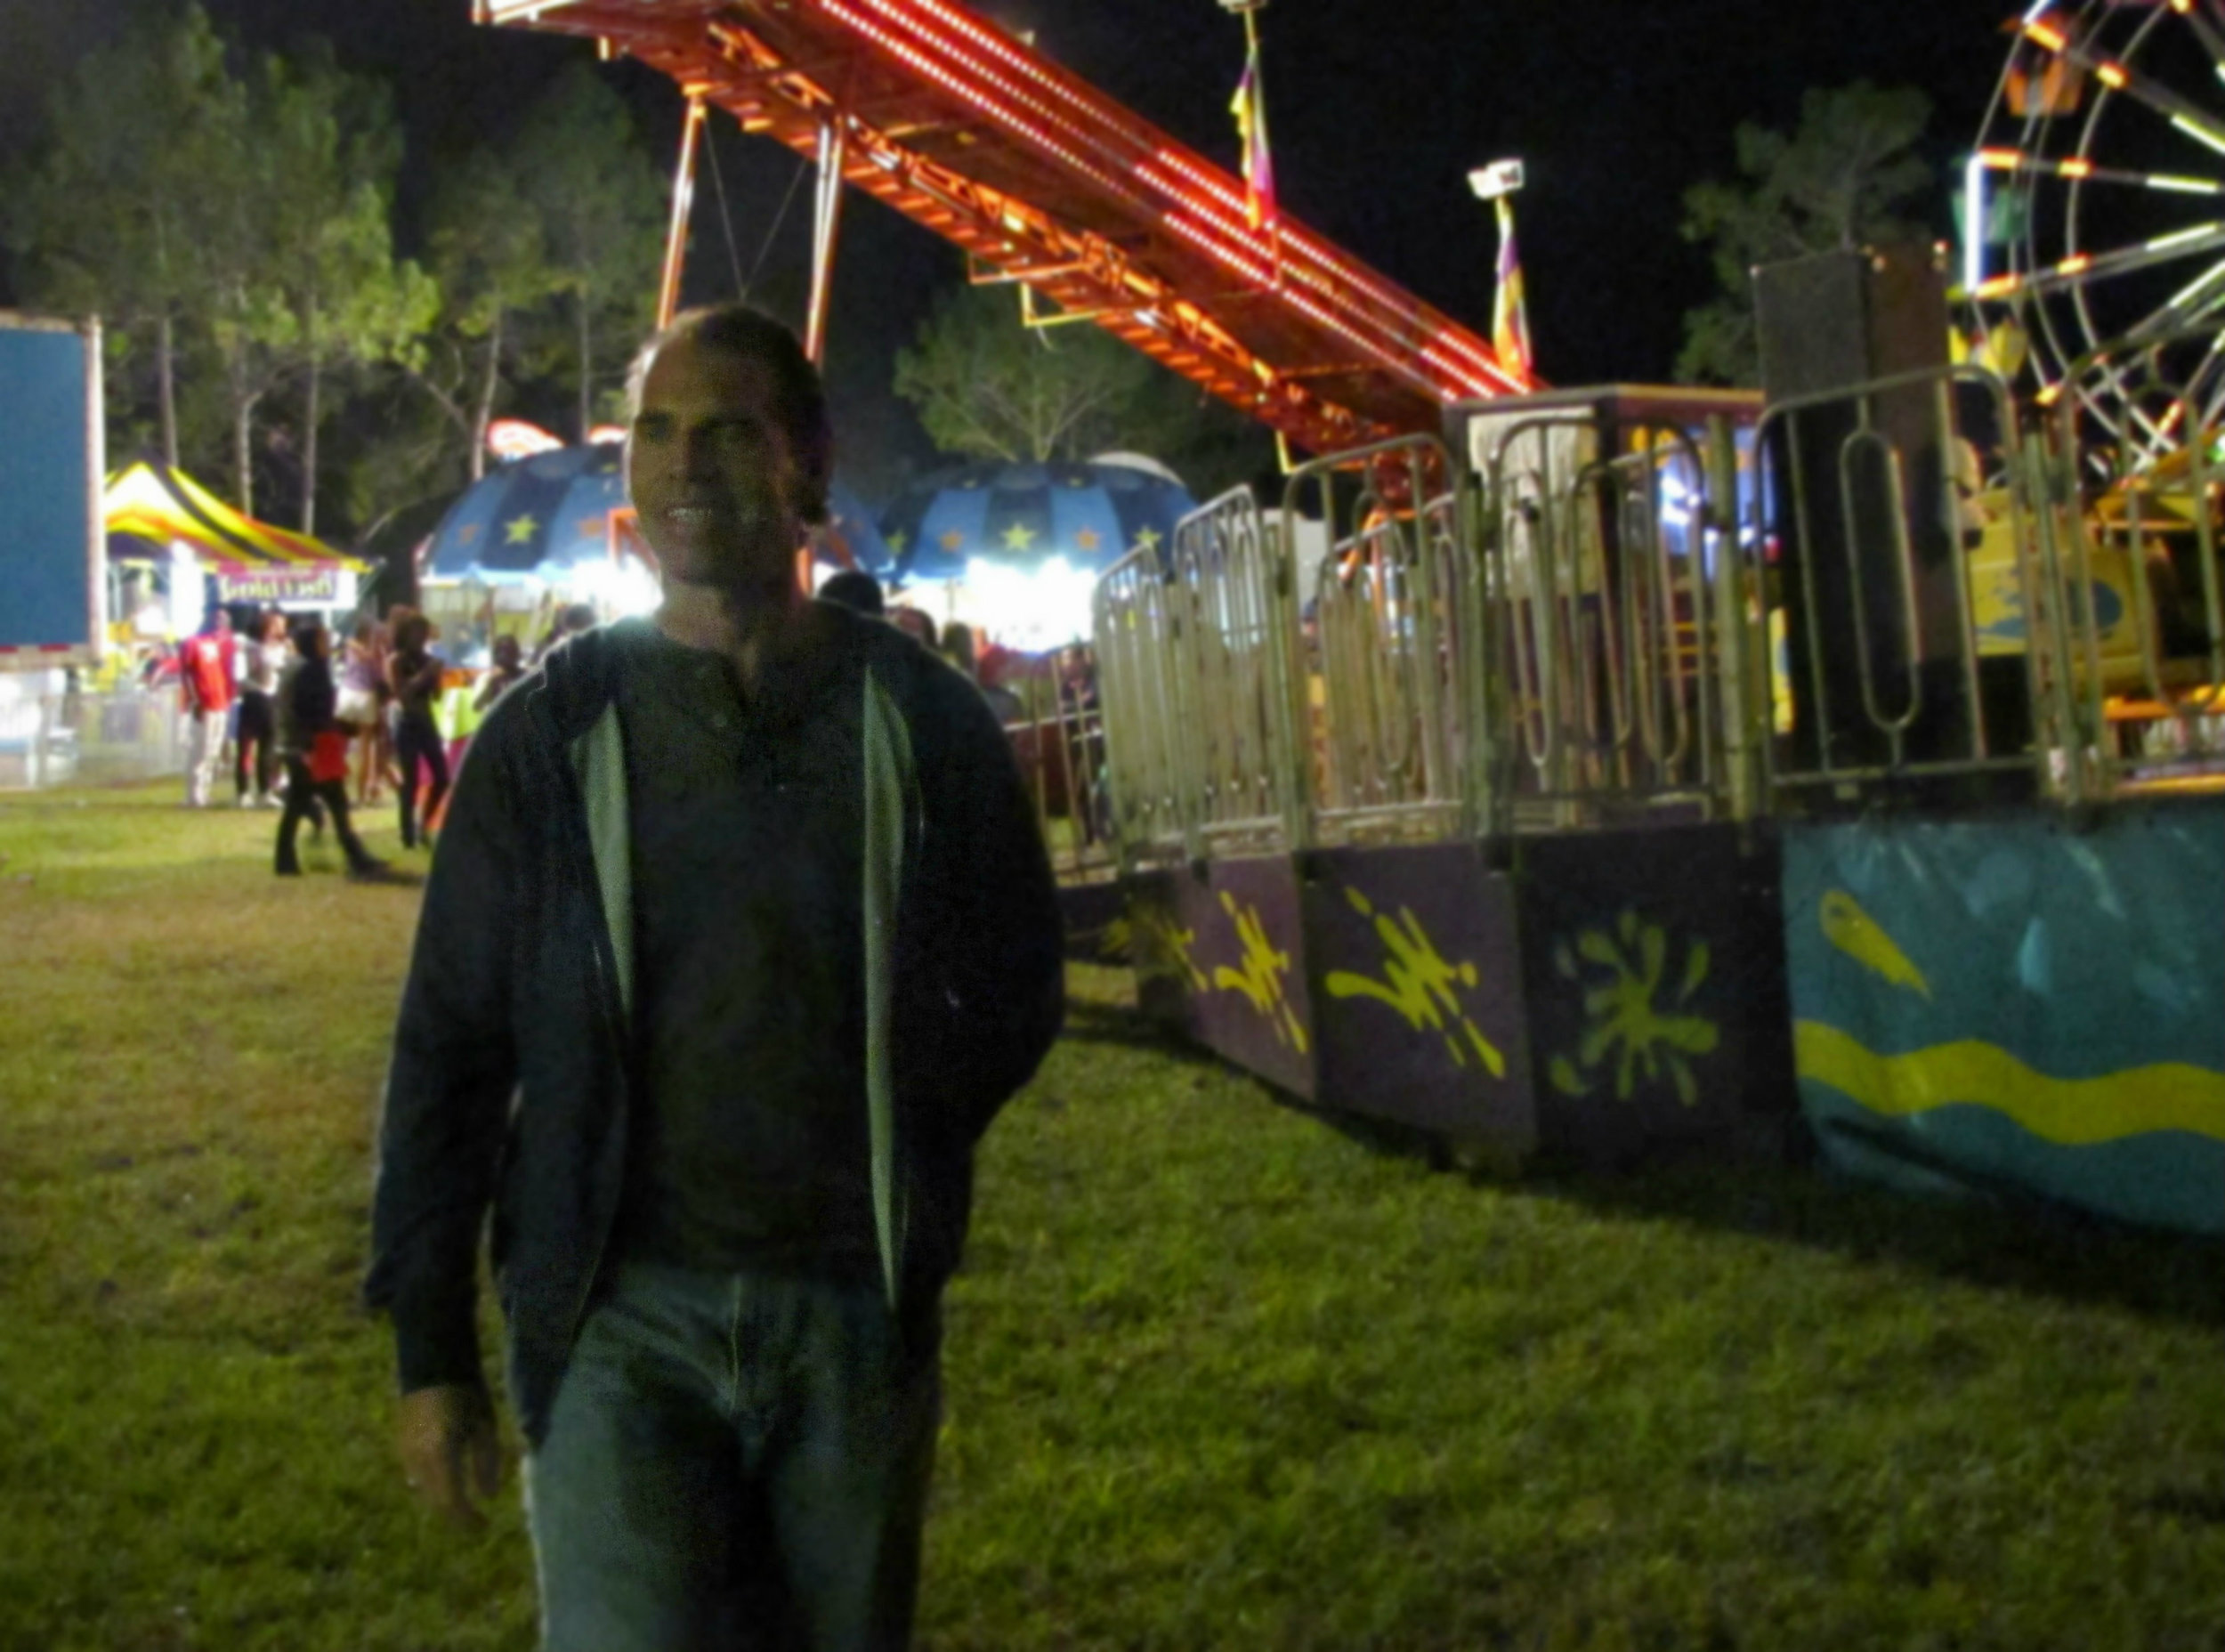 david minshall - carnival